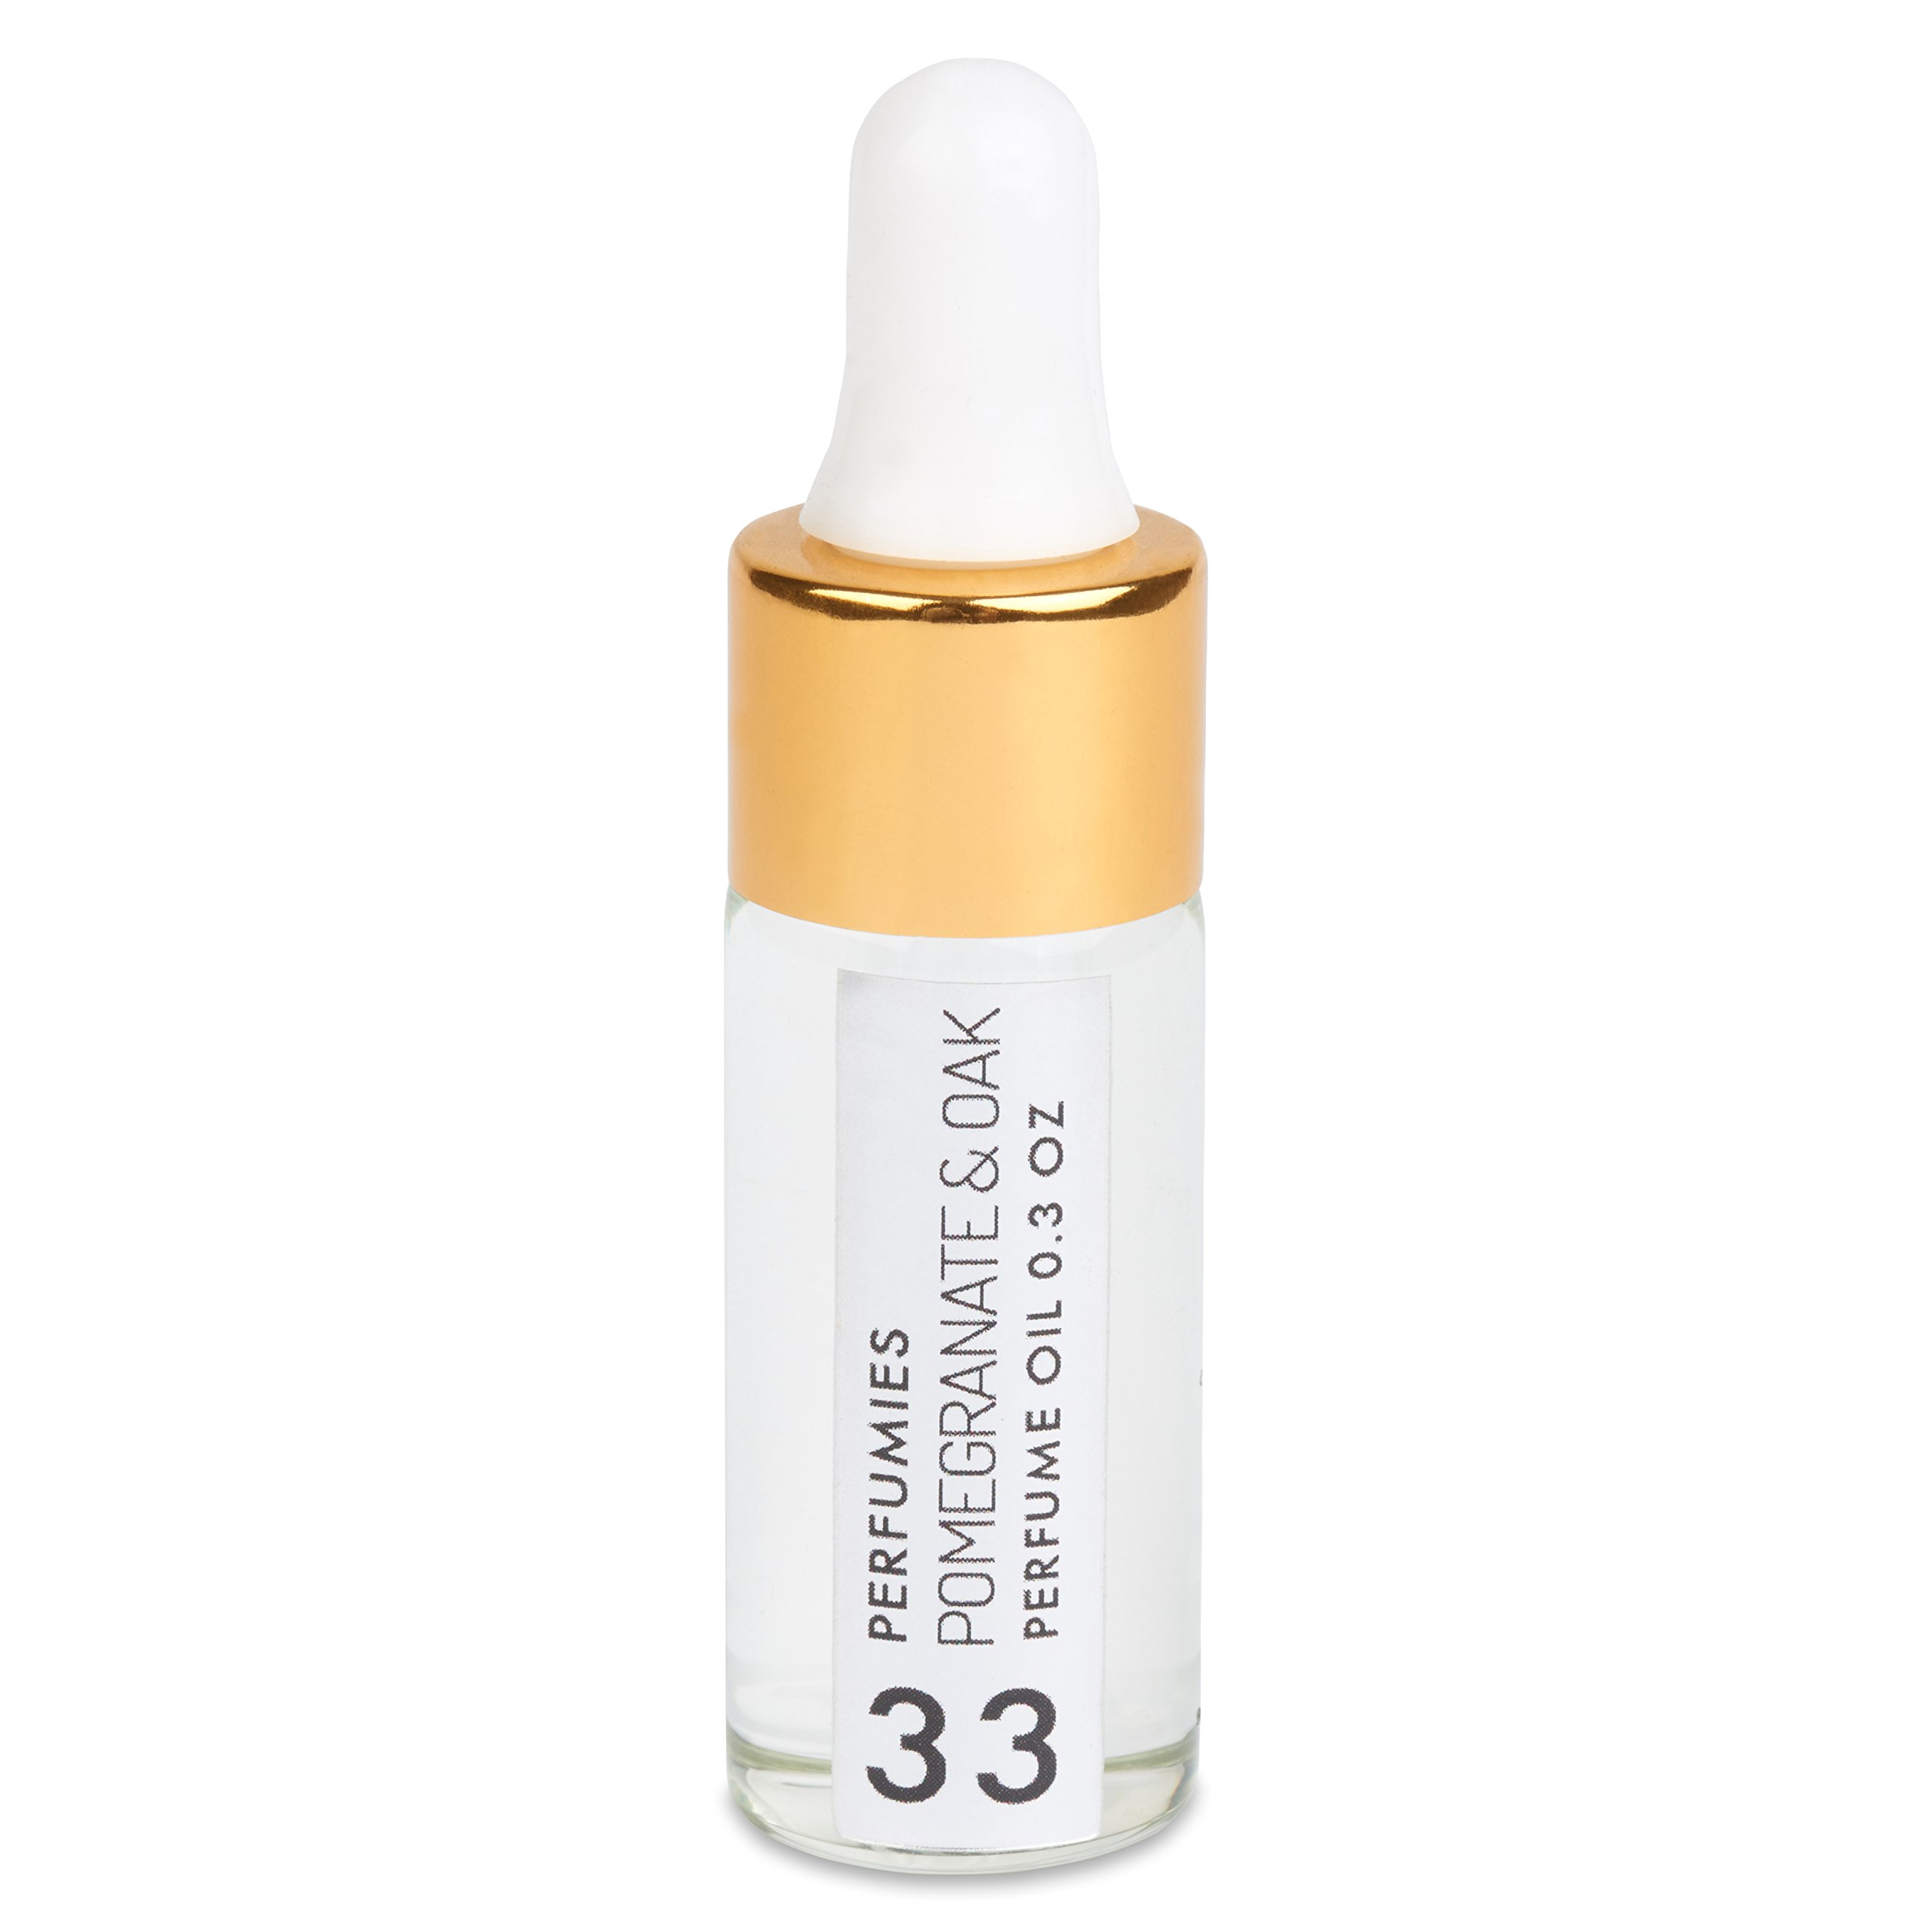 Perfumies Pomegranate & Oak Travel Perfume Oil Dropper Bottle No. 33